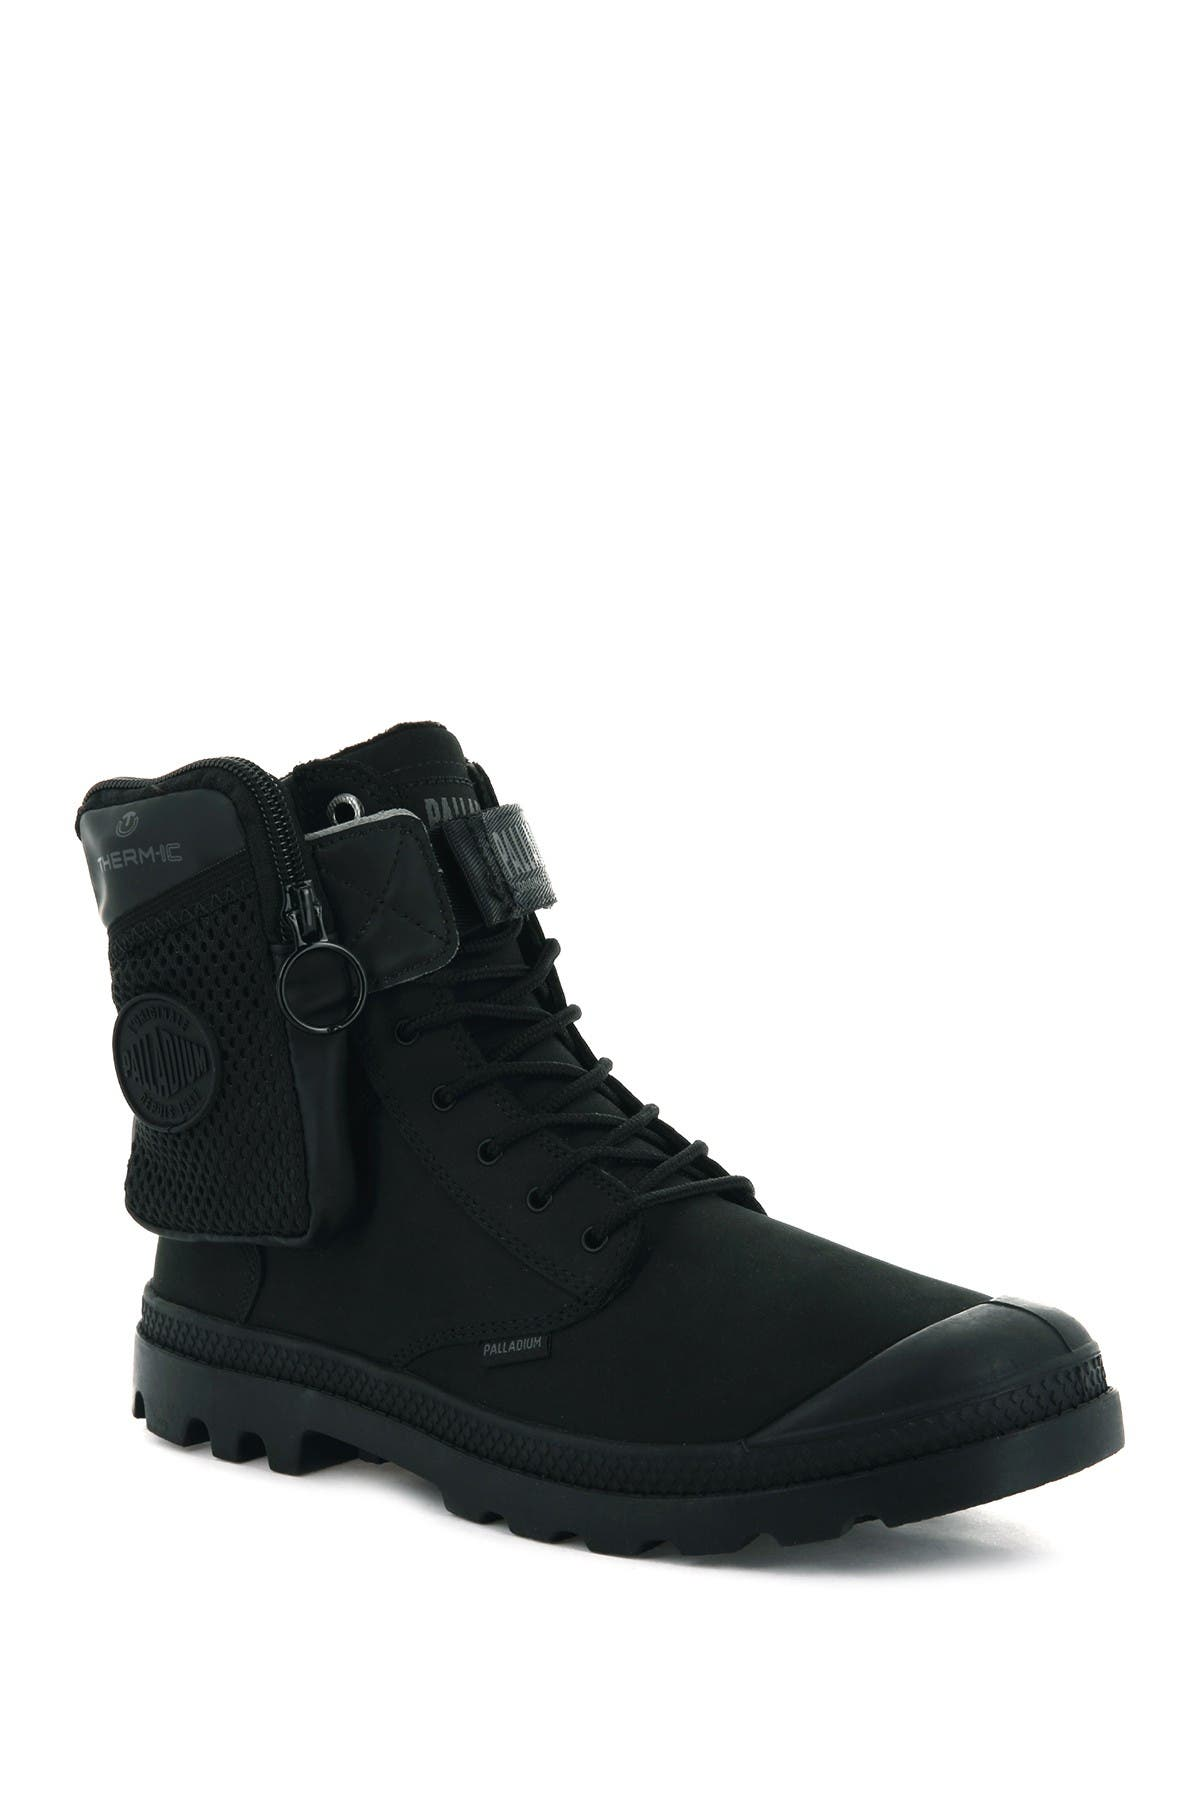 Image of PALLADIUM Sport Cuff Thermic WP+ Sneaker Boot